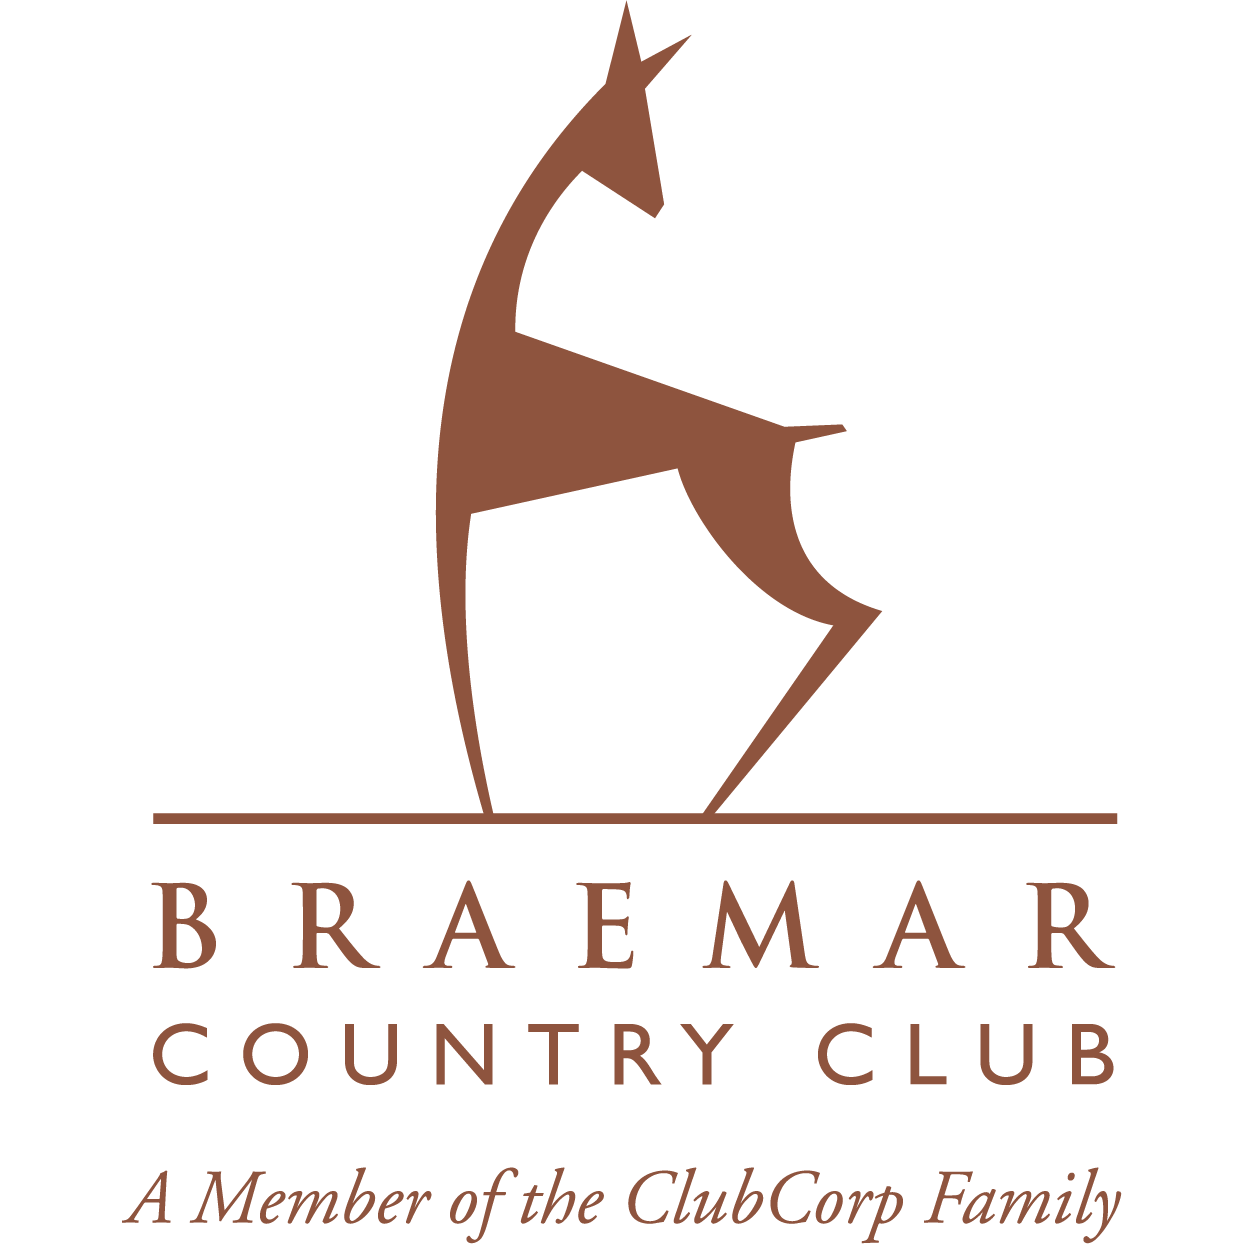 Braemar Country Club image 5